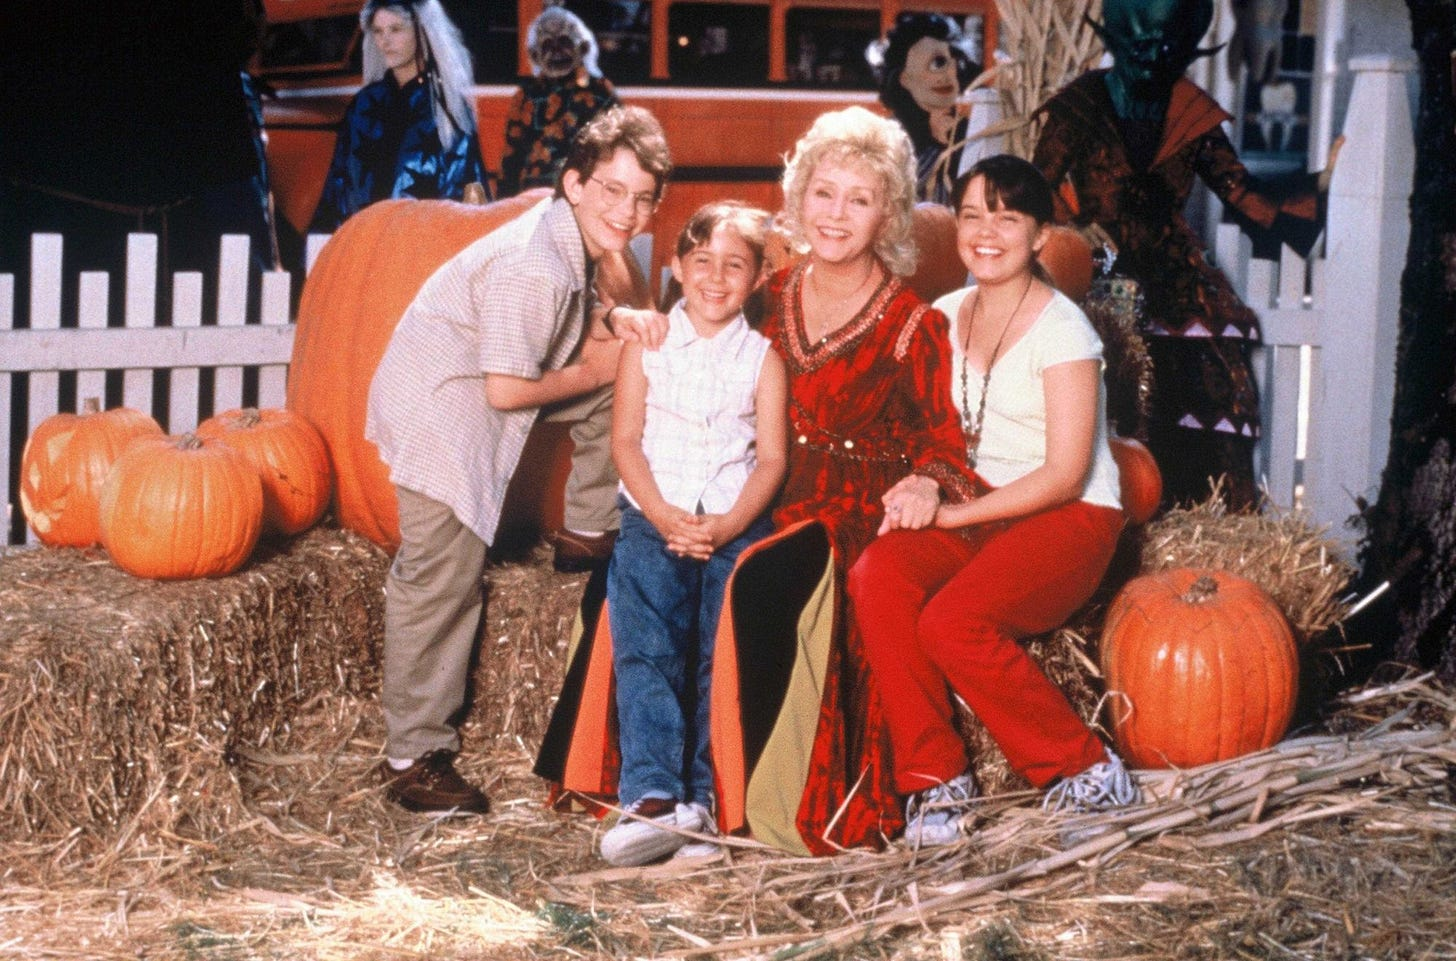 Halloweentown's main cast members.